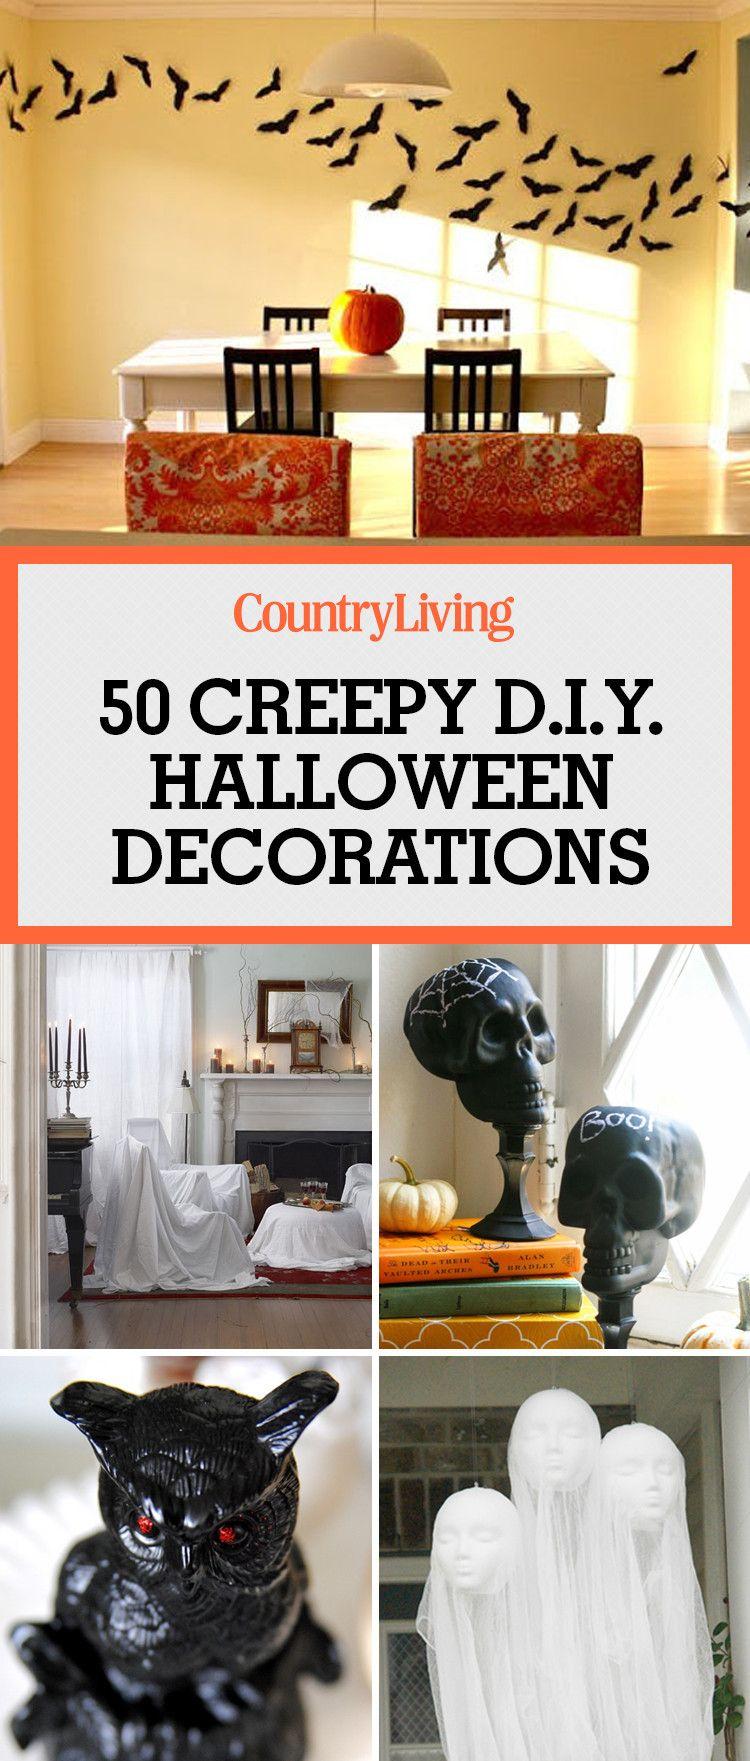 45 easy diy halloween decorations homemade do it yourself 45 easy diy halloween decorations homemade do it yourself halloween decor ideas solutioingenieria Gallery